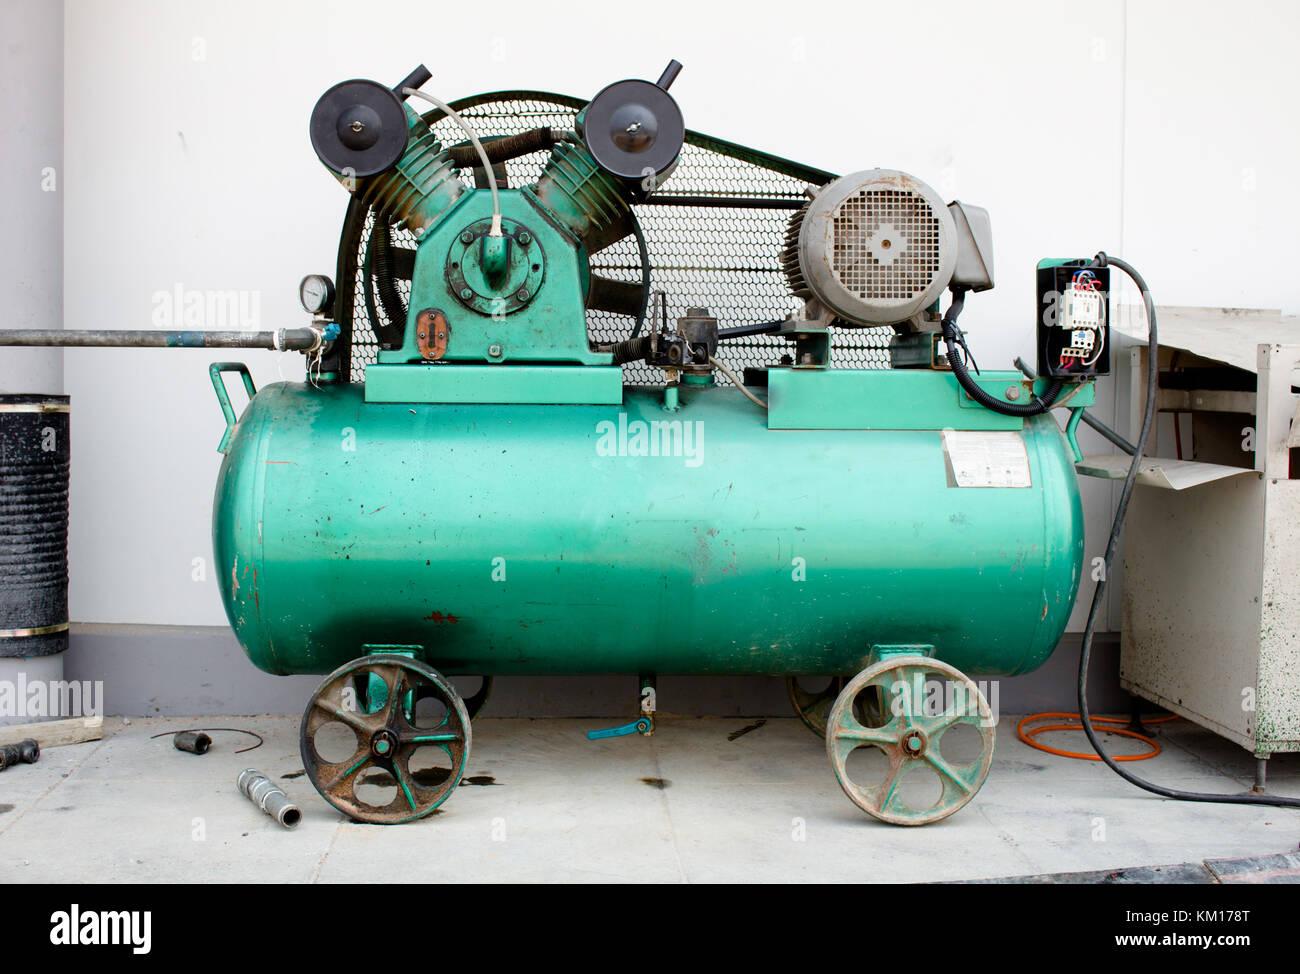 Air Compressor Tank Stock Photos Amp Air Compressor Tank